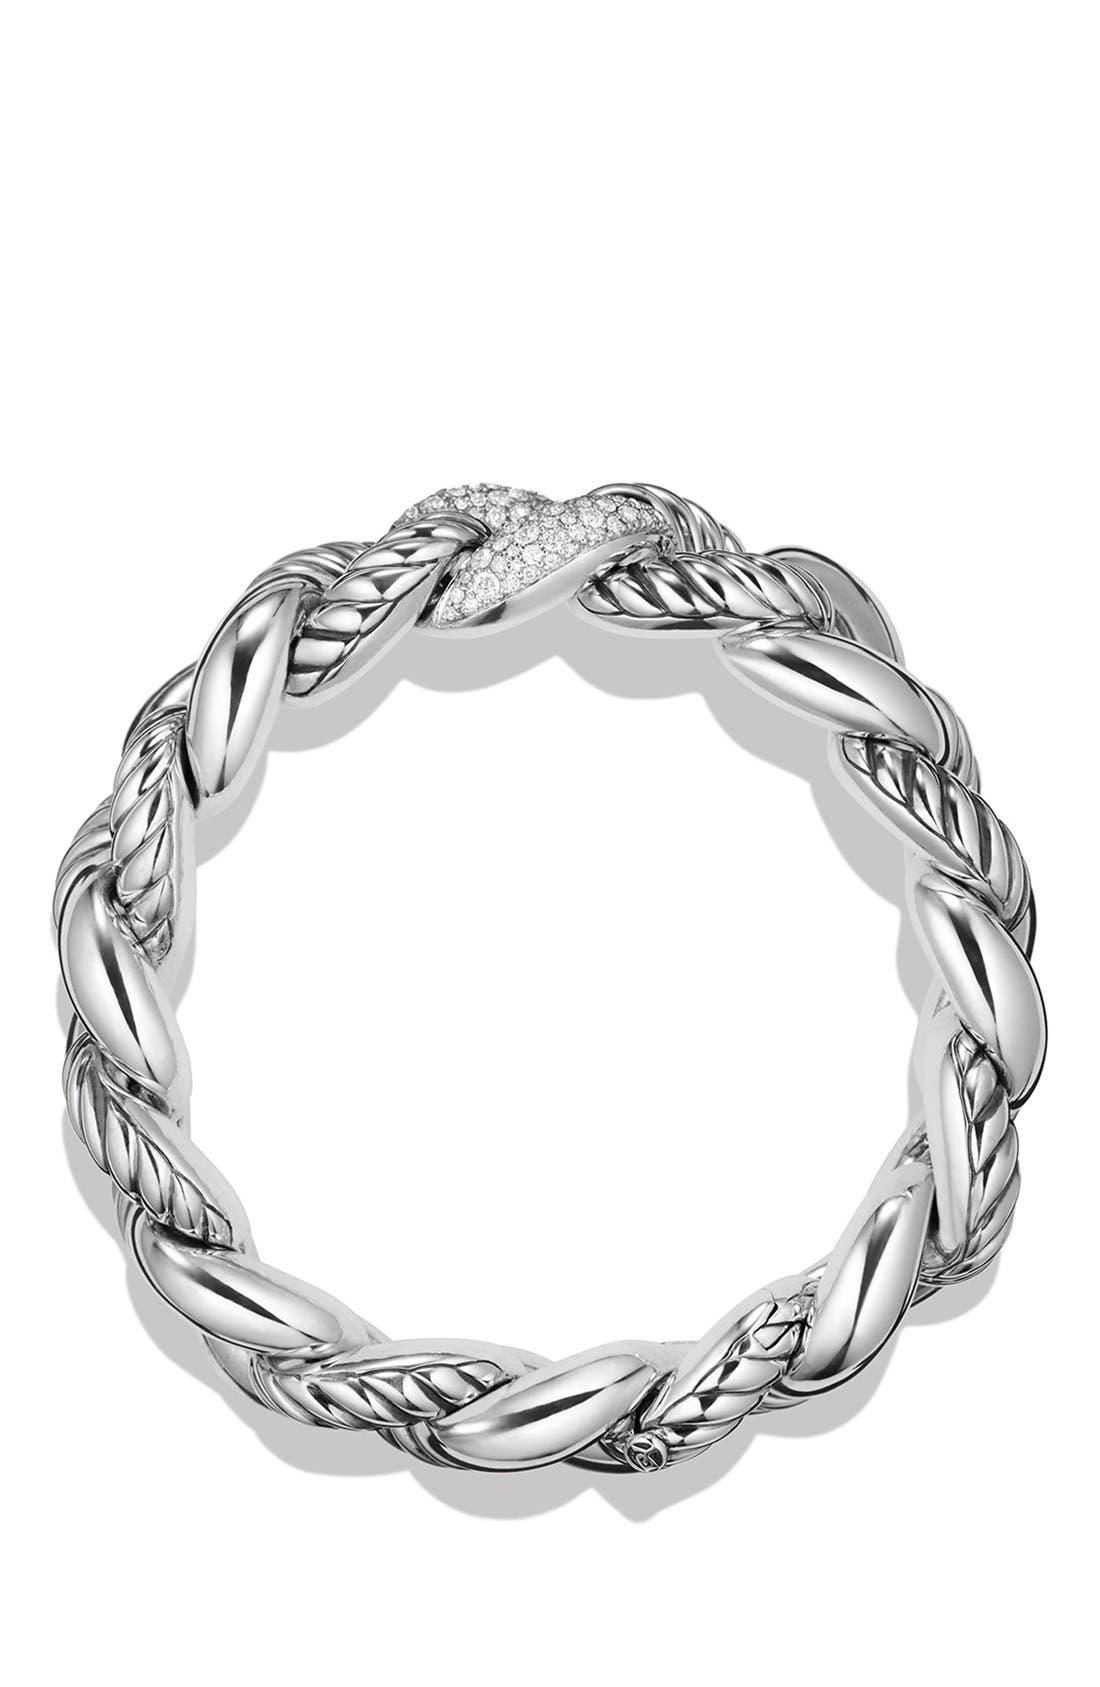 Alternate Image 2  - David Yurman'Belmont' Curb Link Bracelet with Diamonds